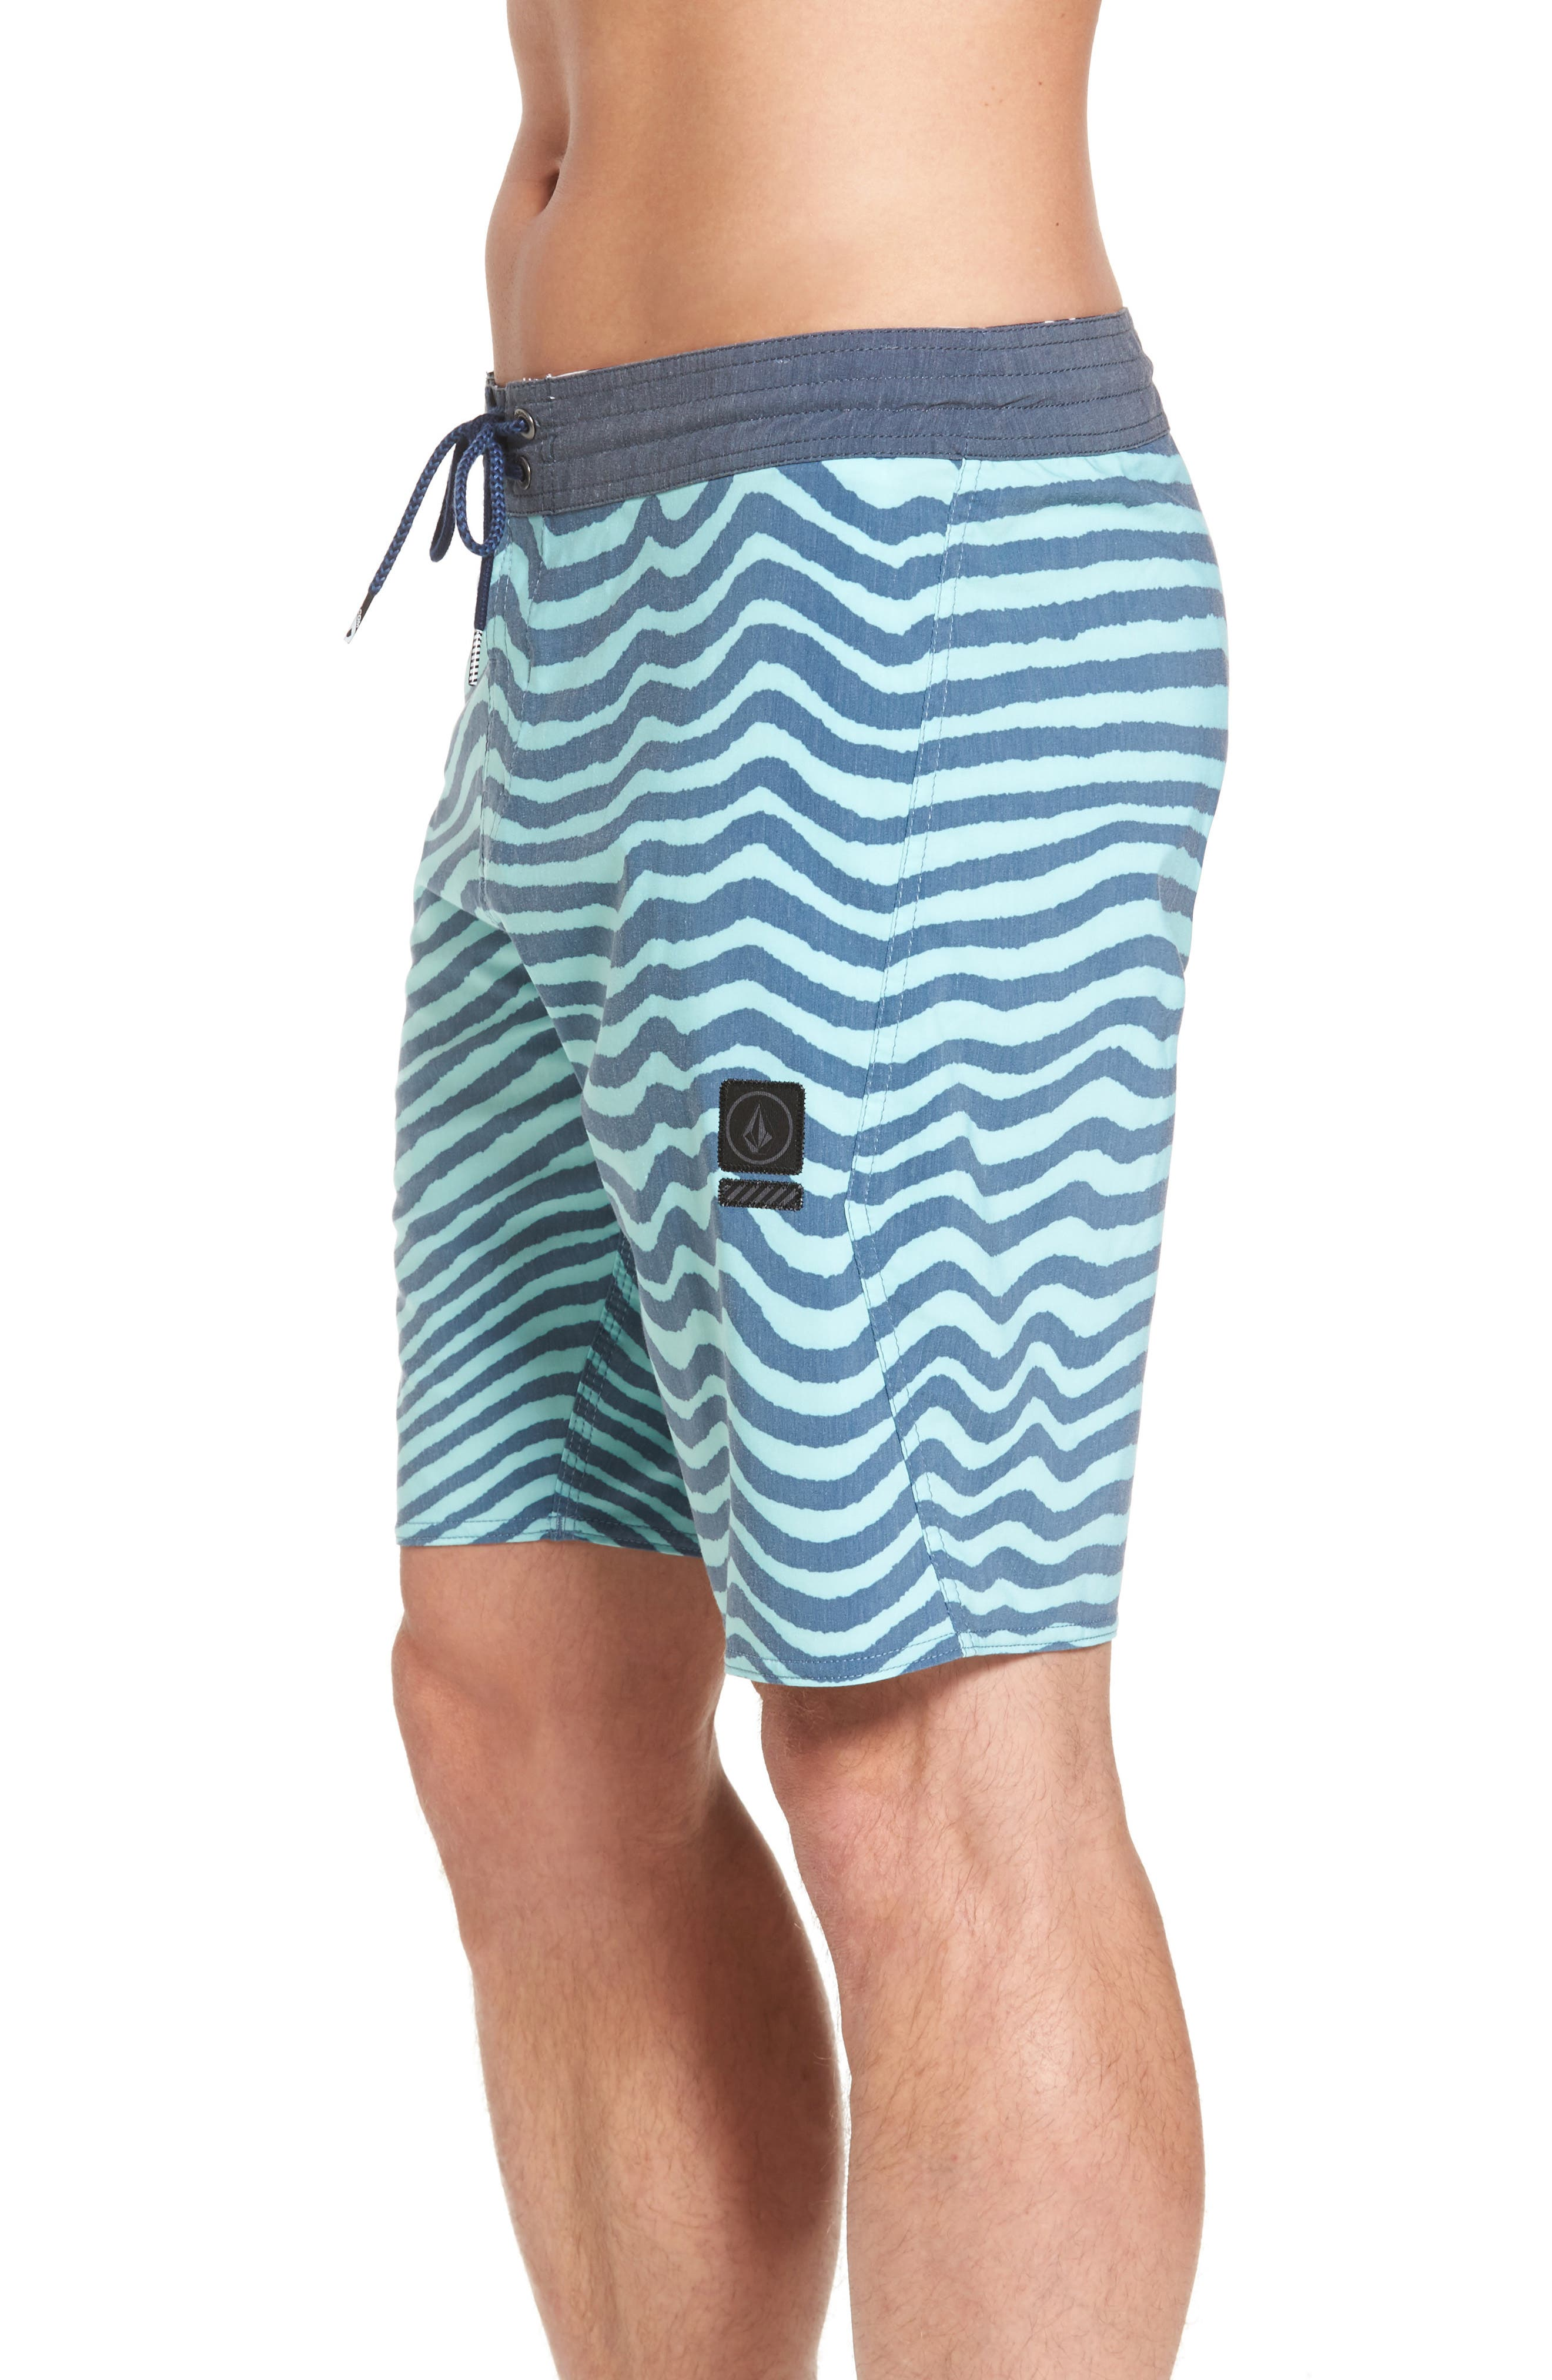 Stripey Slinger Board Shorts,                             Alternate thumbnail 32, color,